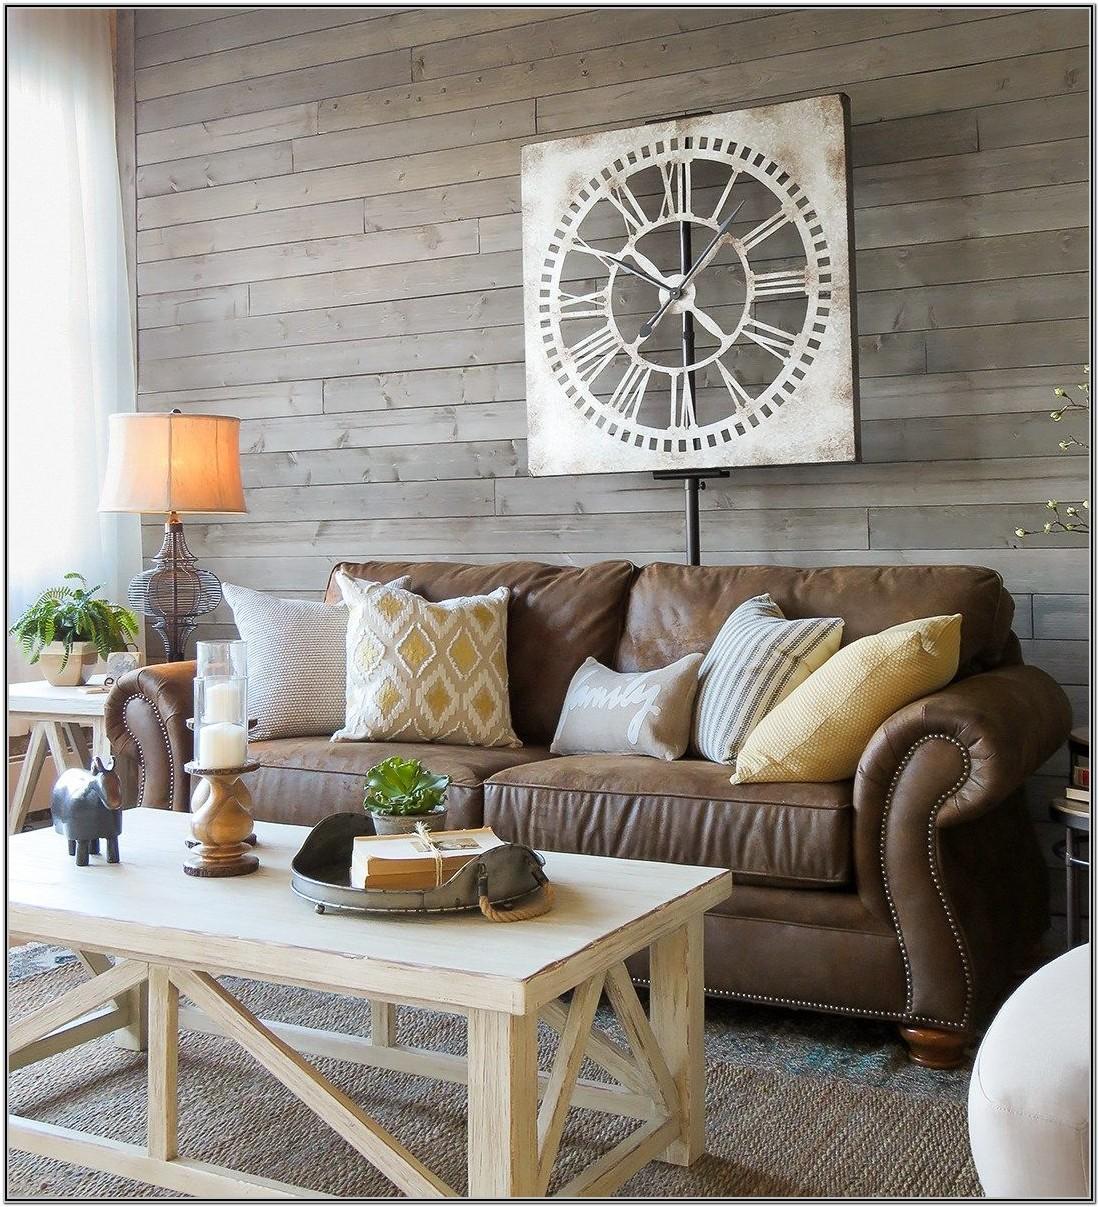 Farmhouse Style Simple Living Room Wall Decor